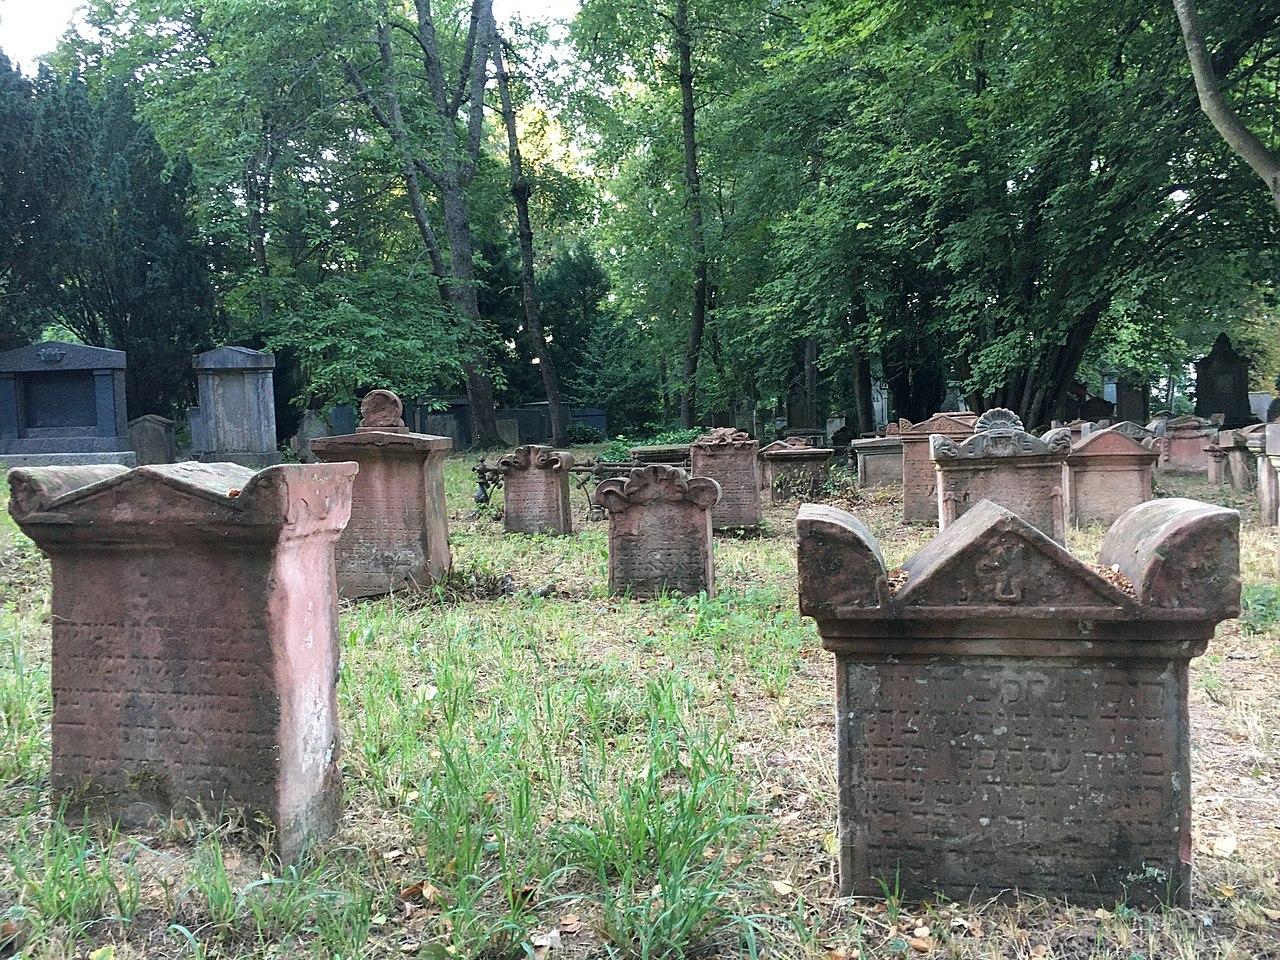 Jüdischer Friedhof Landau Pfalz 2.jpg